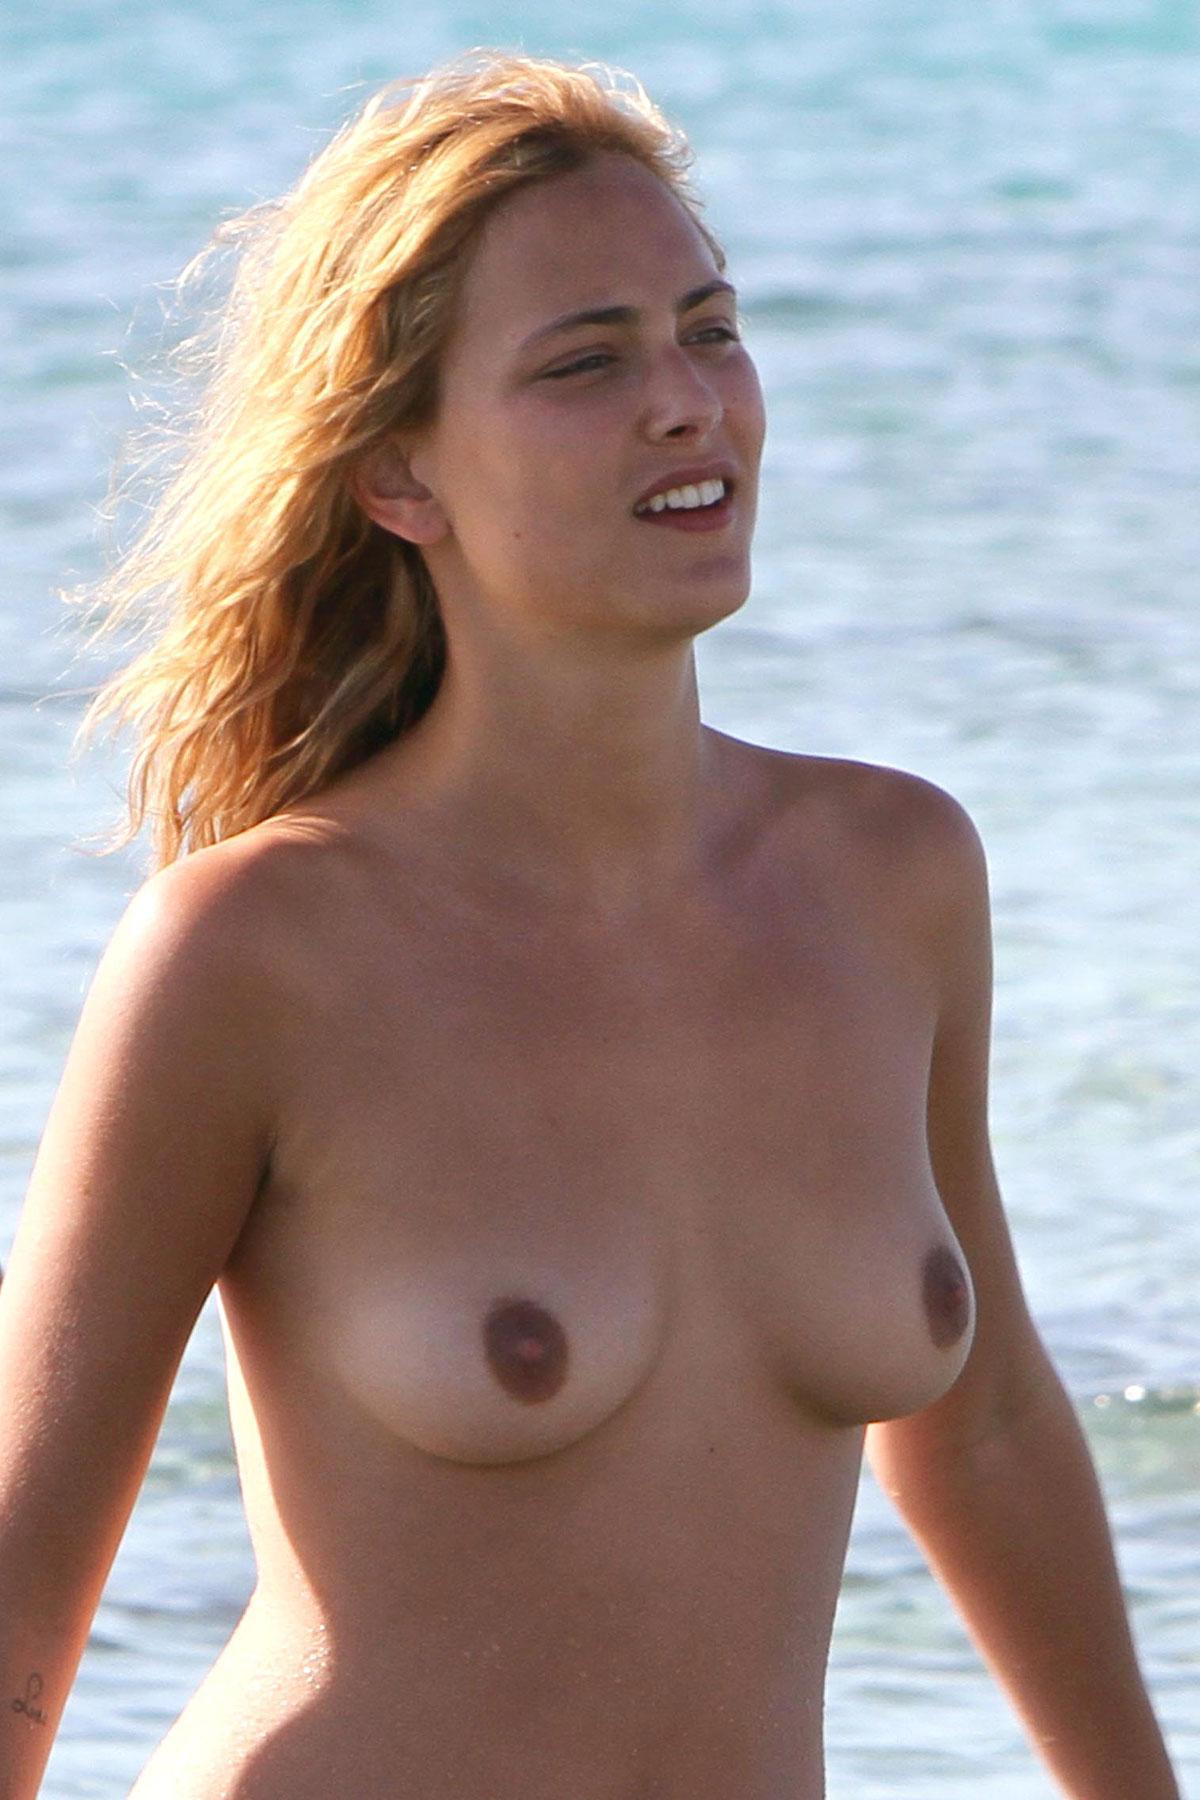 America Olivo Desnuda nude - pics of nora arnezeder nude, naked, topless, oops